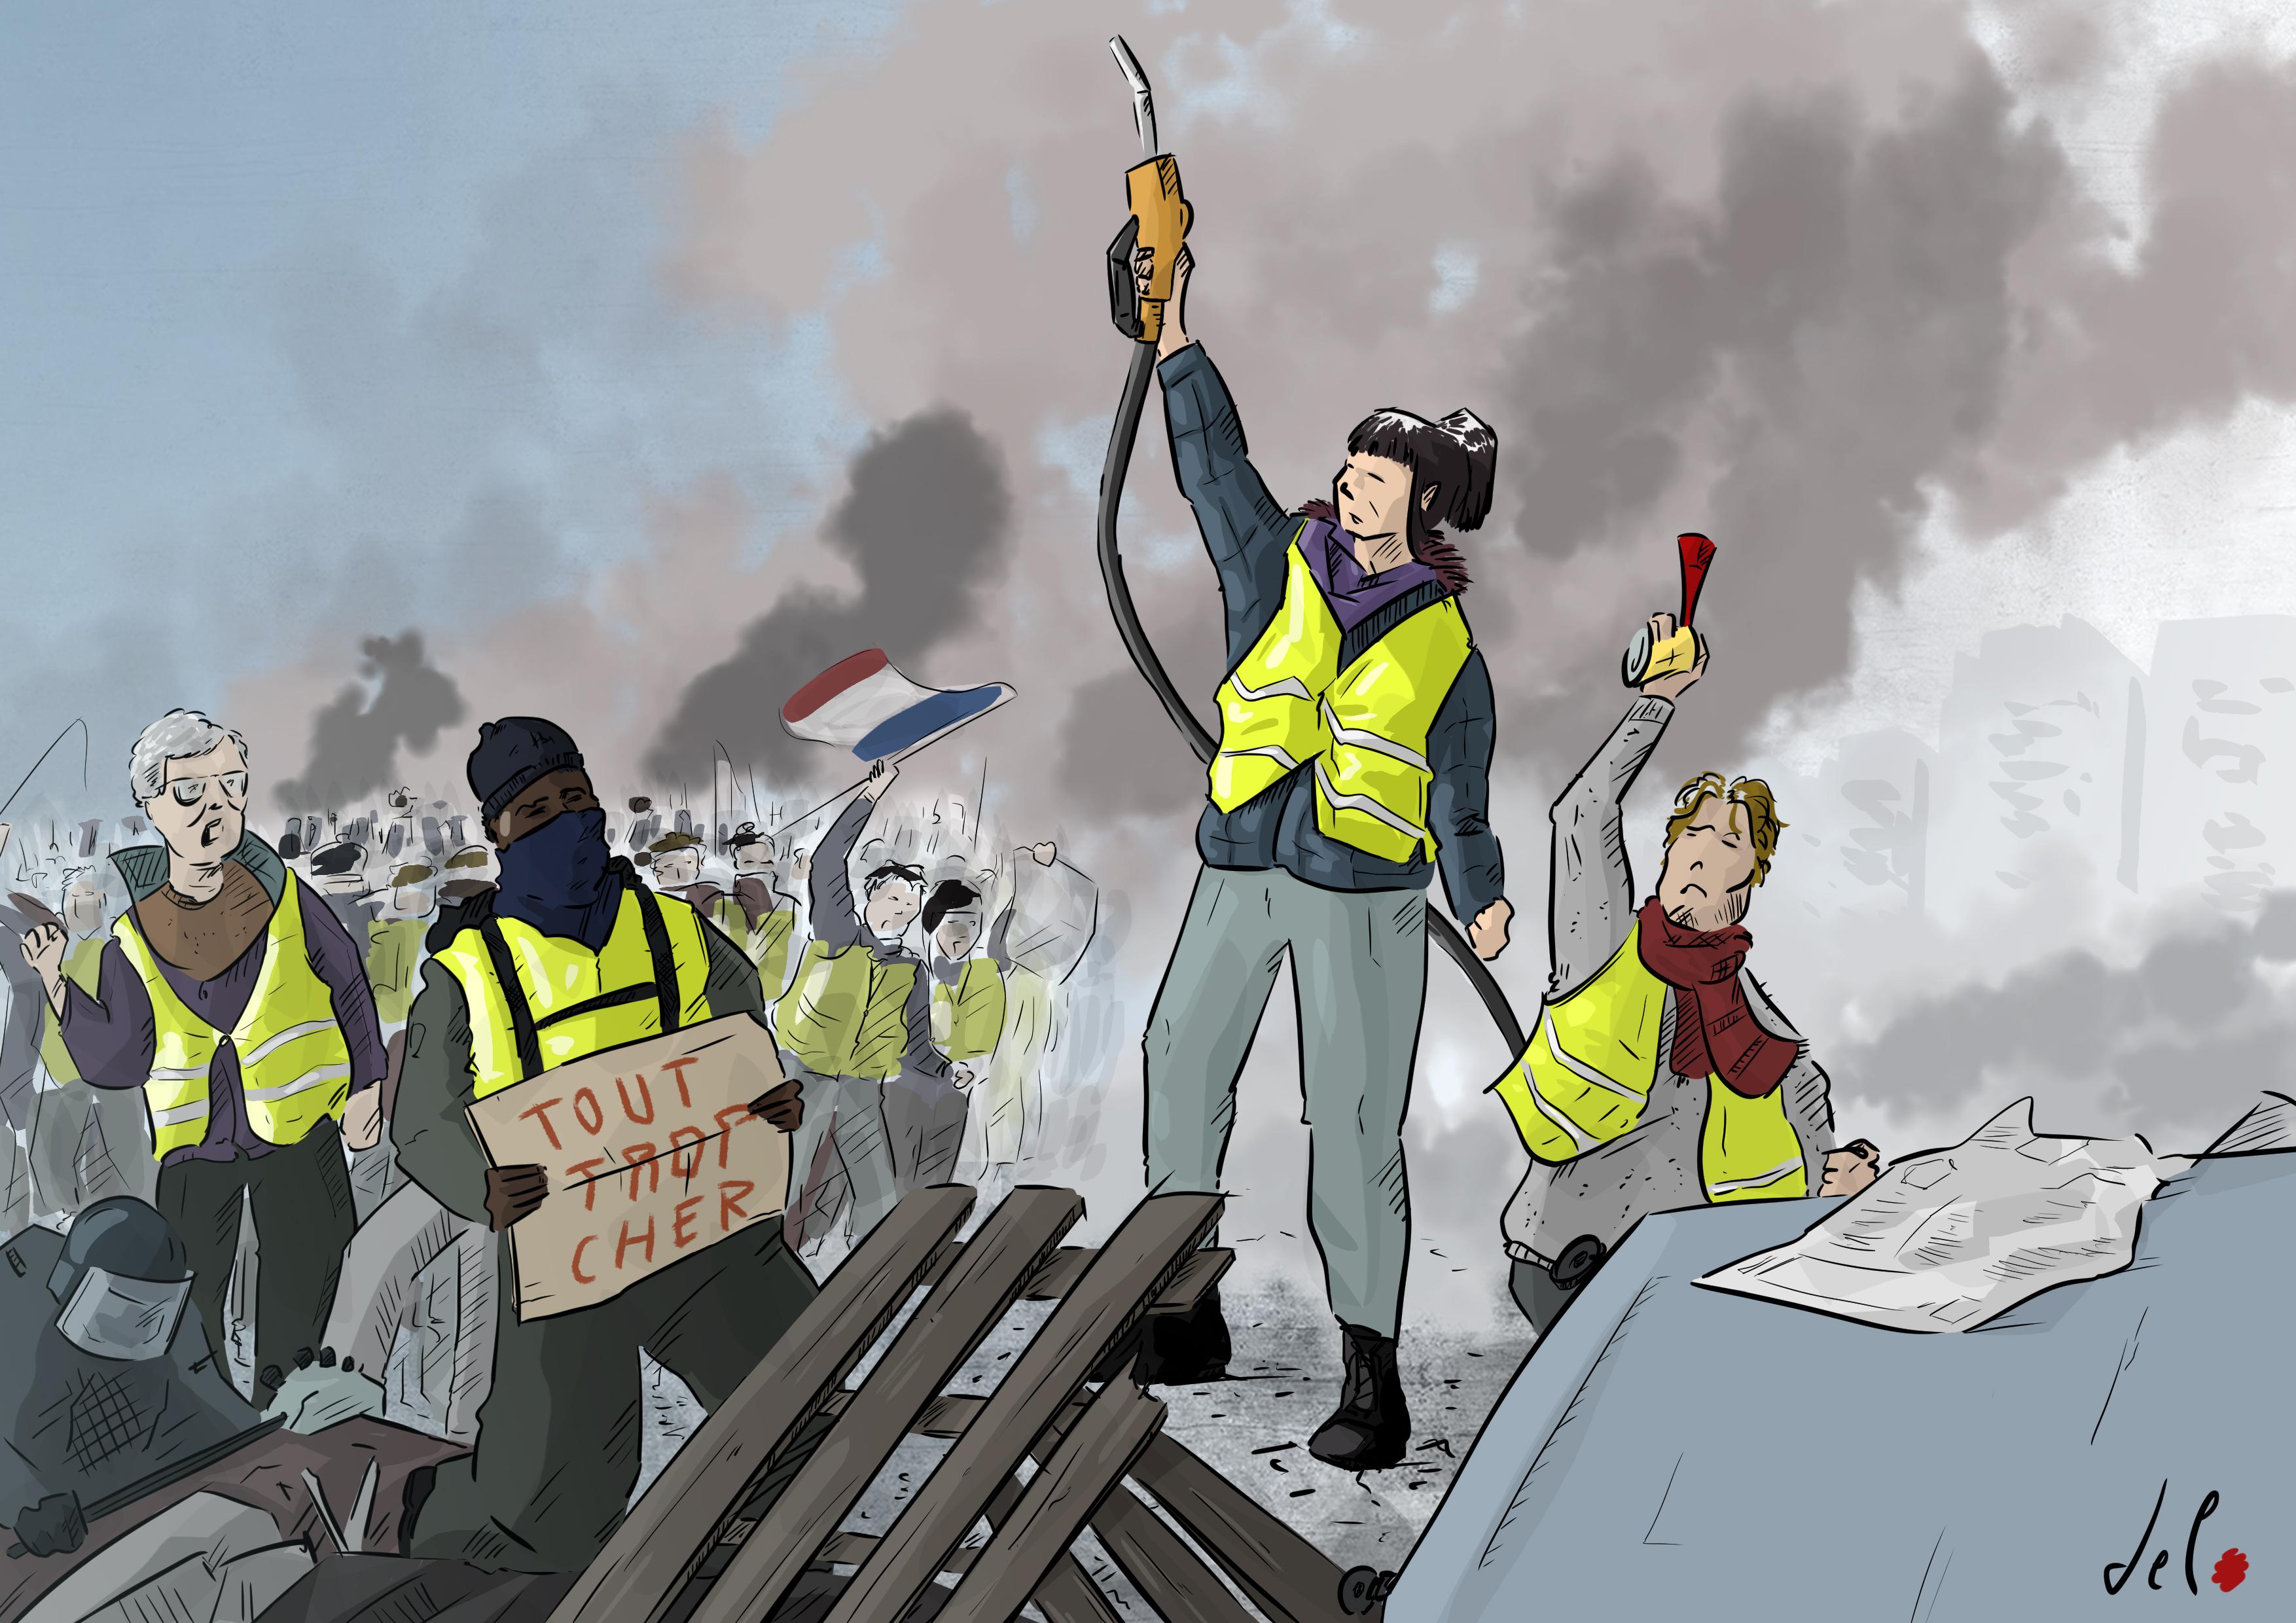 u201cle gilet guidant le peuple u201d  u2013 del rosso cartoons